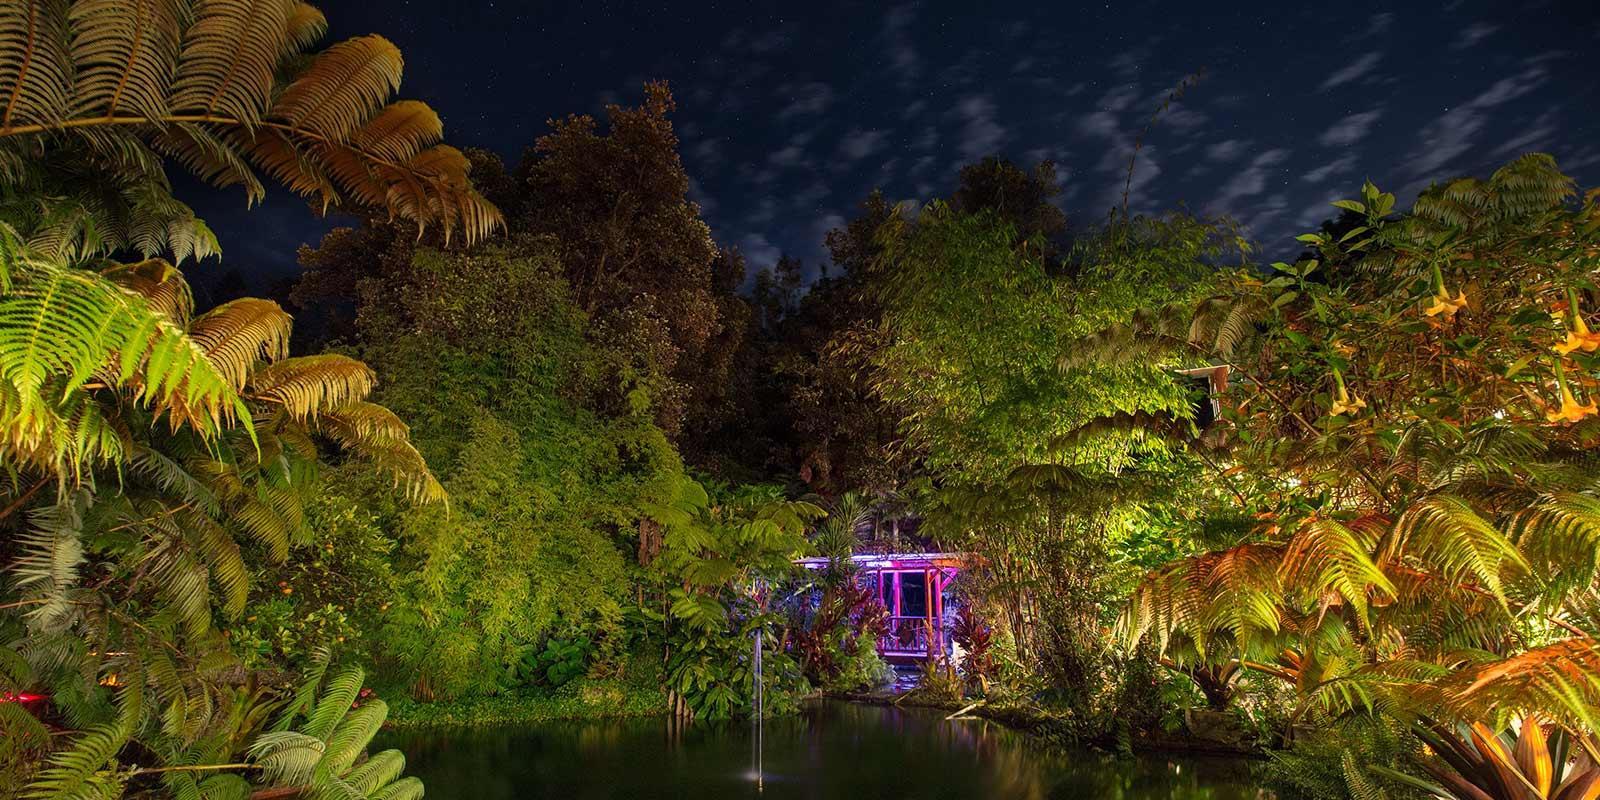 Chalet Kilauea Hotel Pond Stars